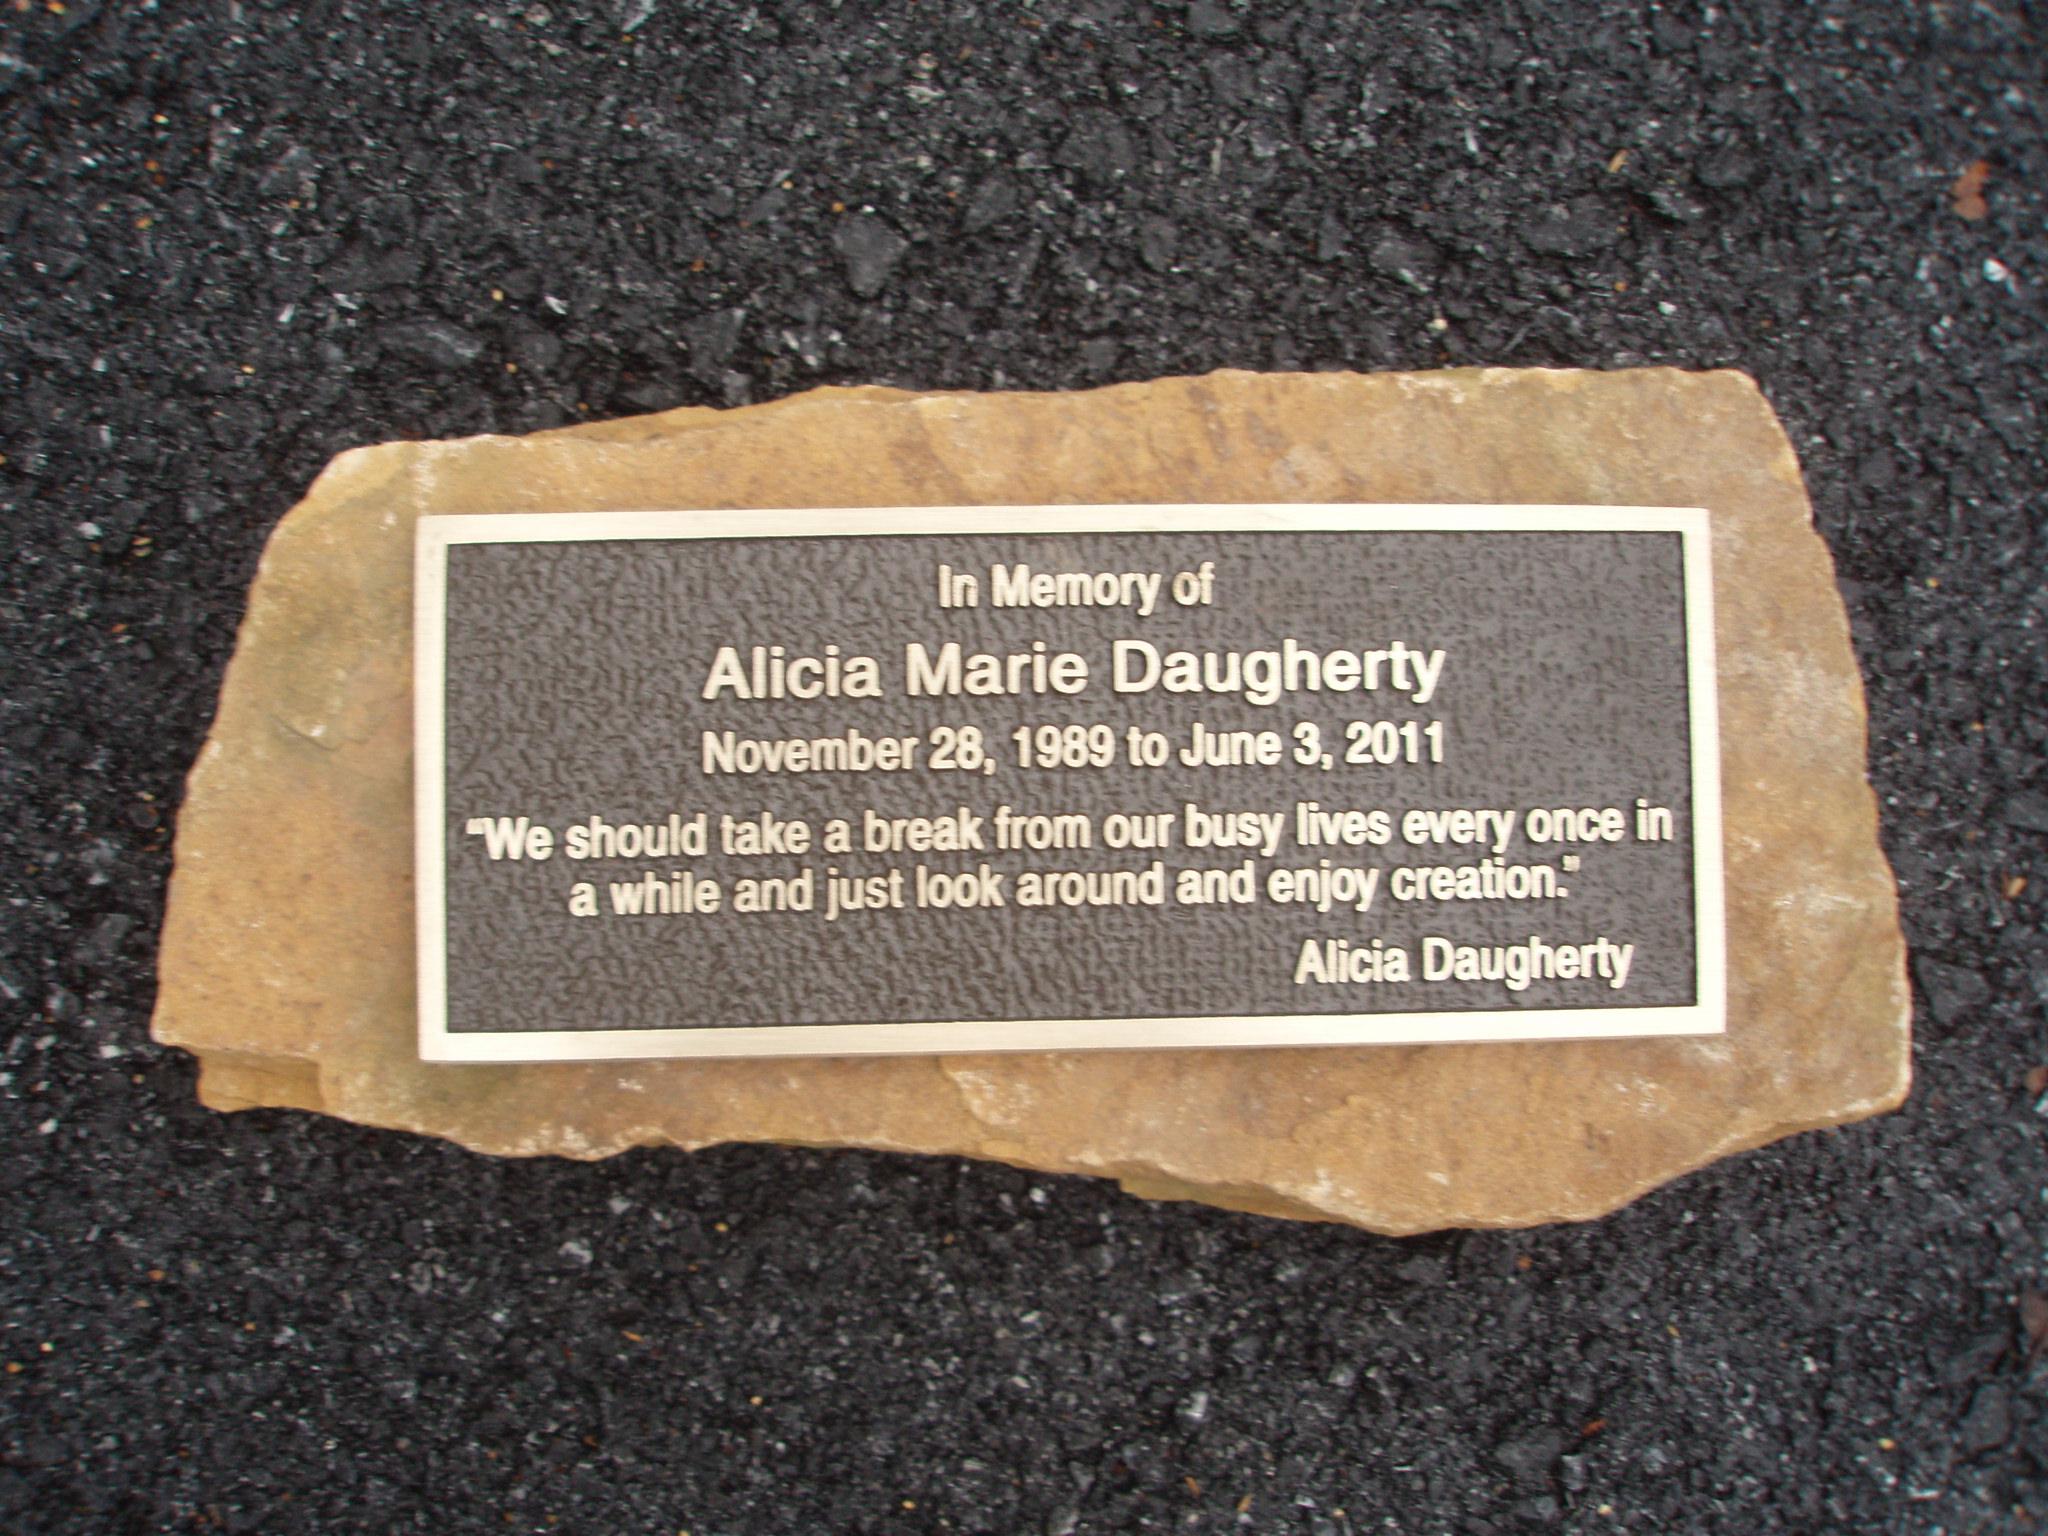 March 24 2012 Memorial Dedication At Pinchot Park 171 Alicia